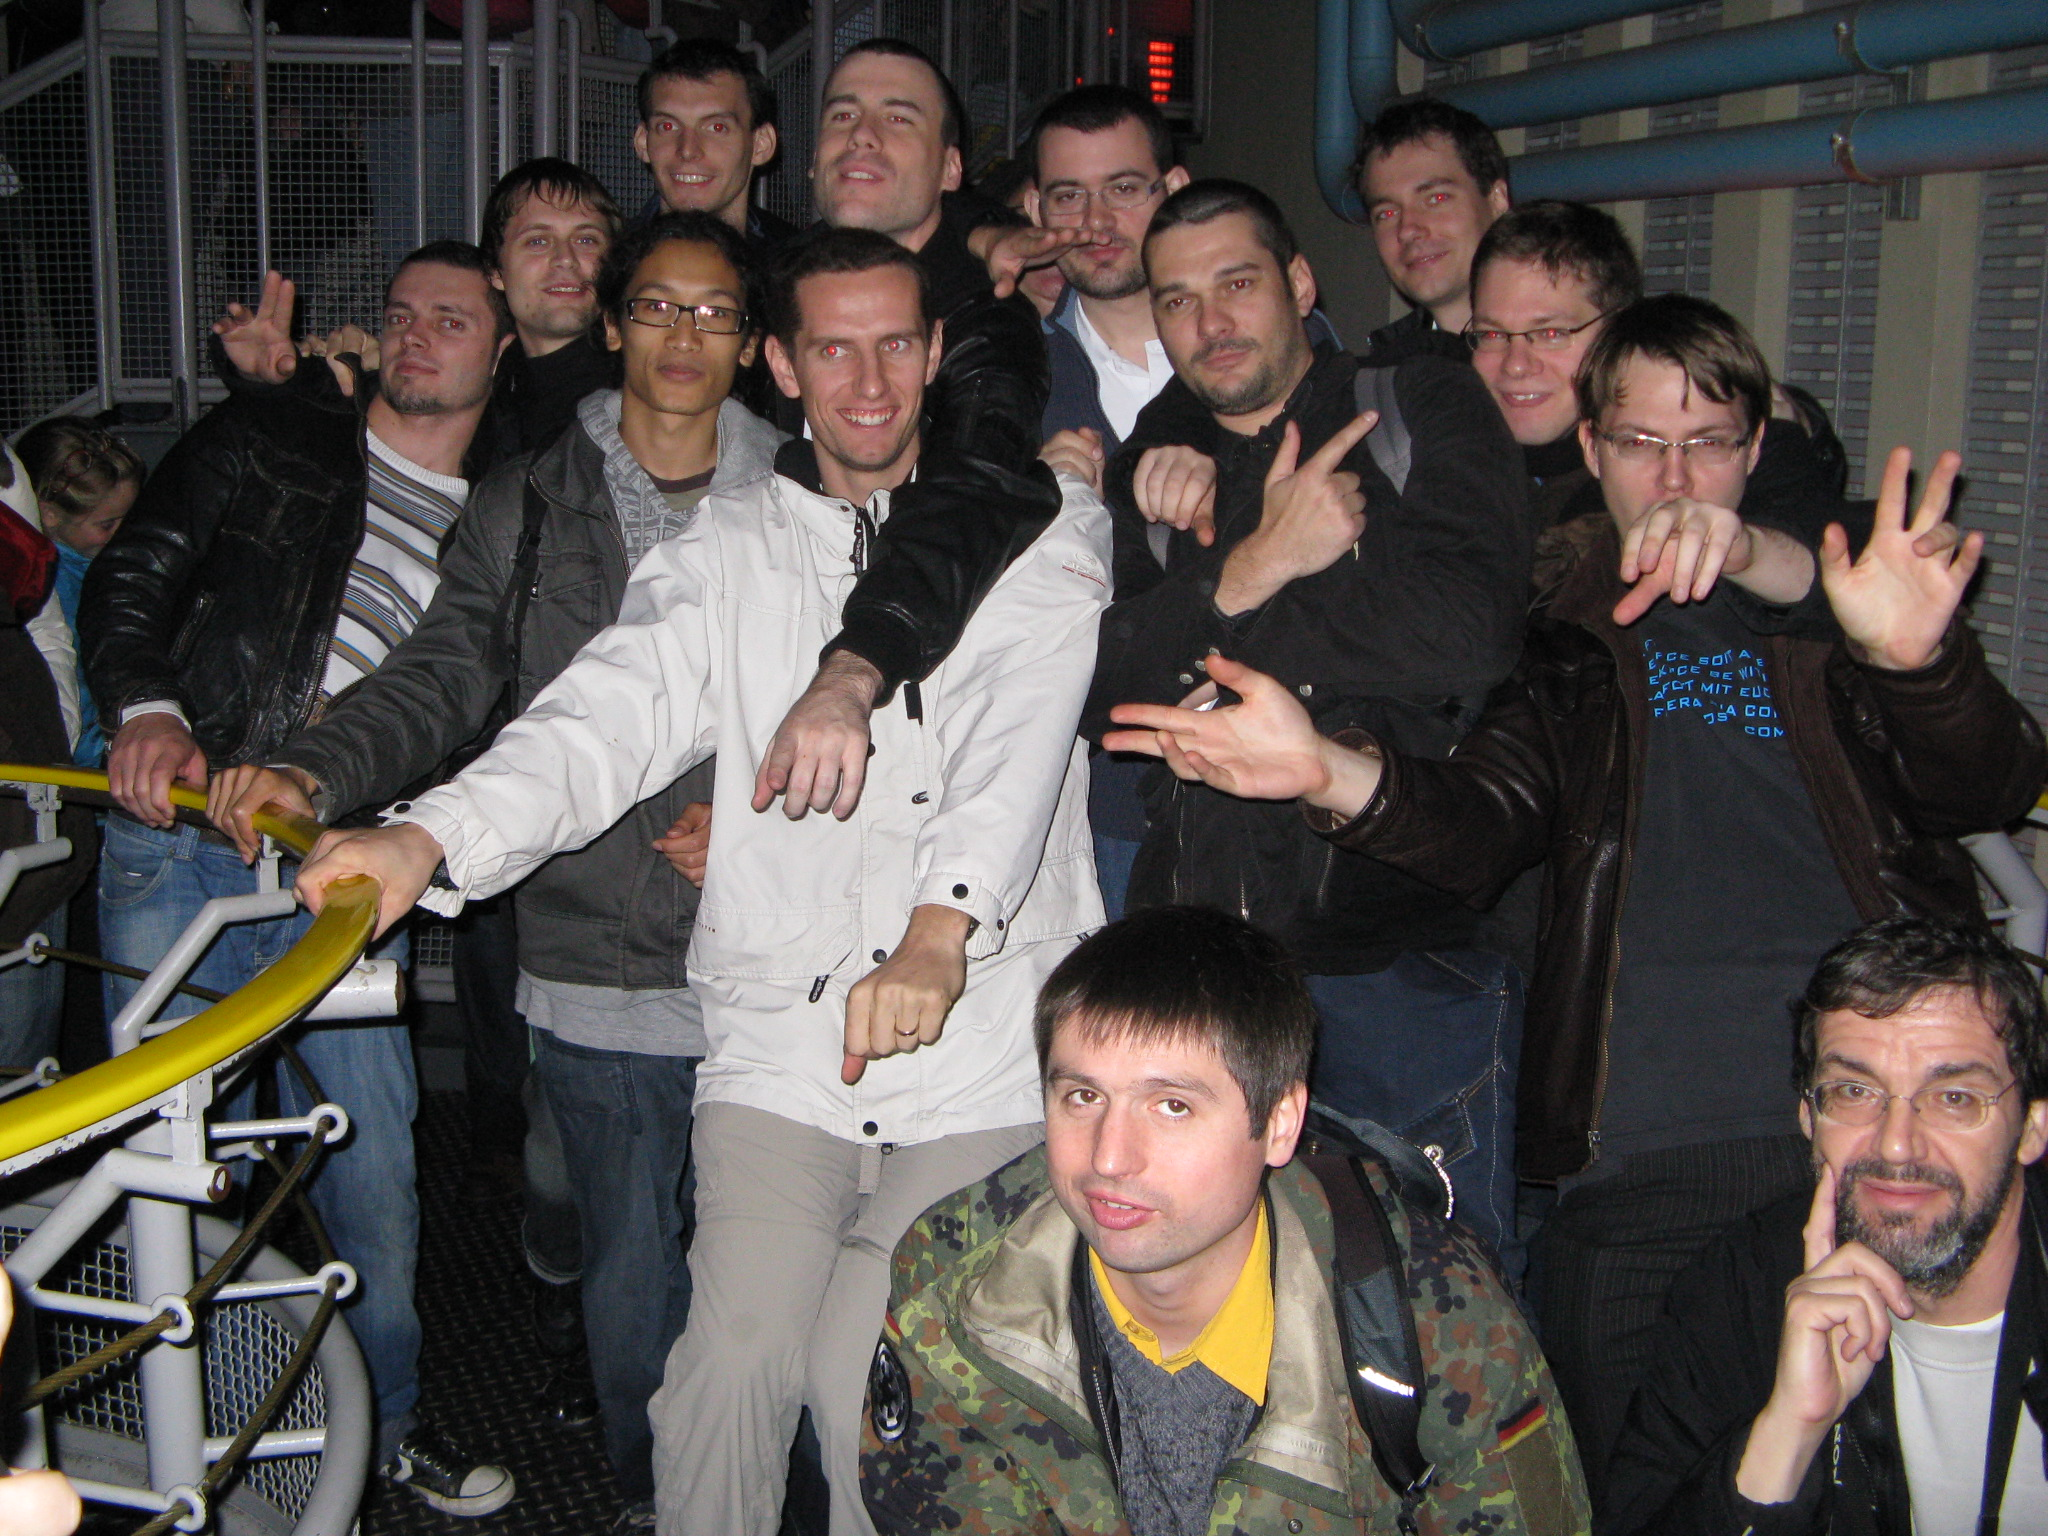 Photo 37 - Kardass, c3po75, will-jacen, obionescarabi, dref, Skarn, padawanthrawn, mouleu, Anakin07, Alpha8, Joruus29, boba.fett7, Jeff